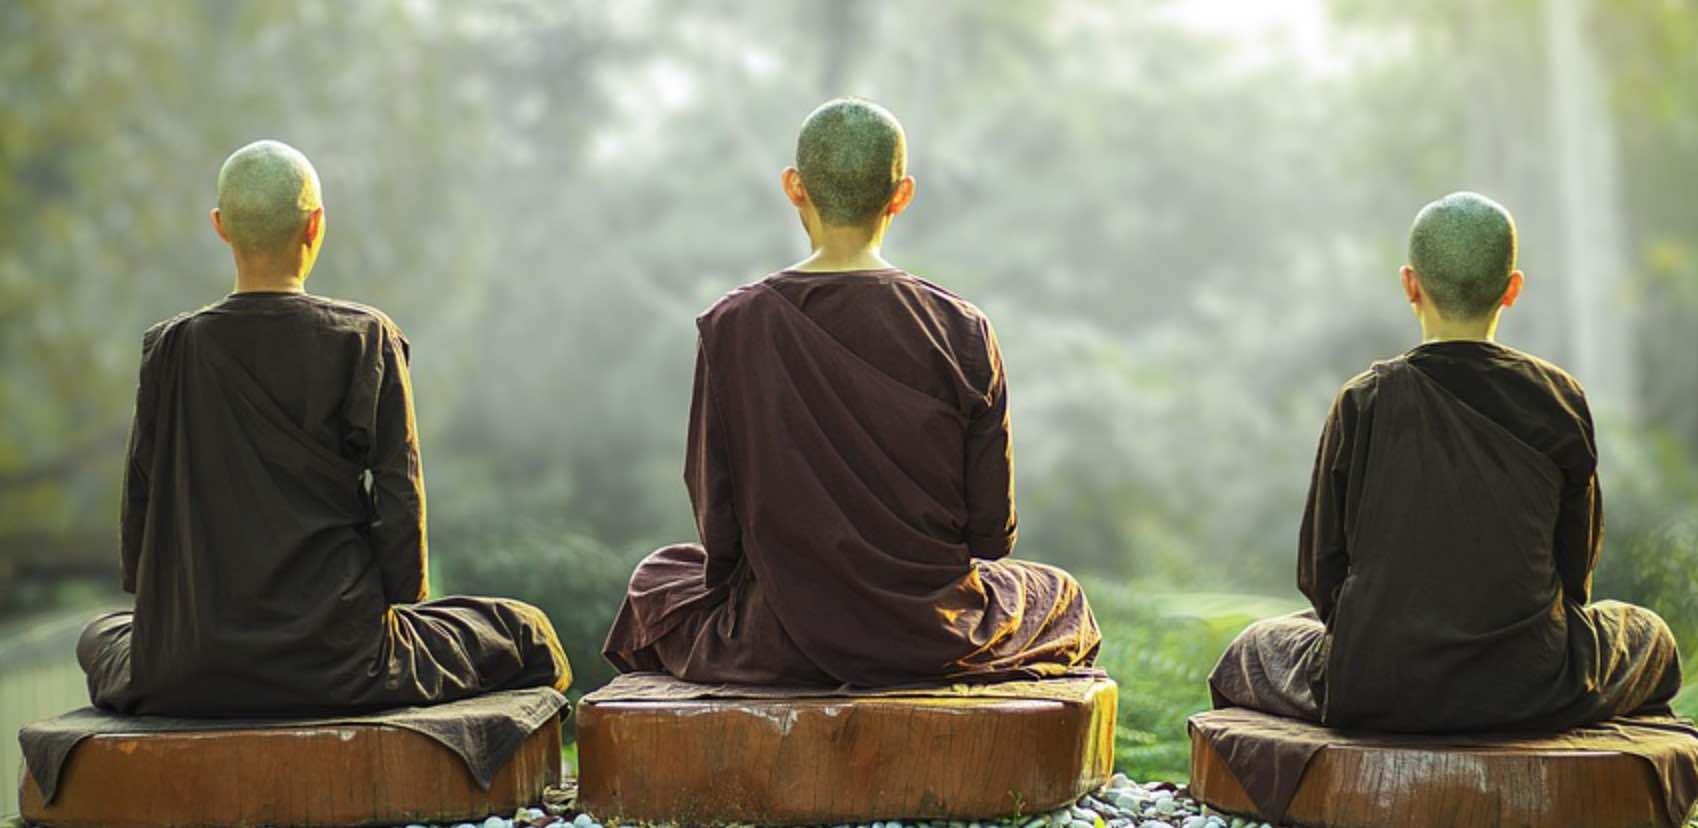 Cara Meditasi Menurut Buddha